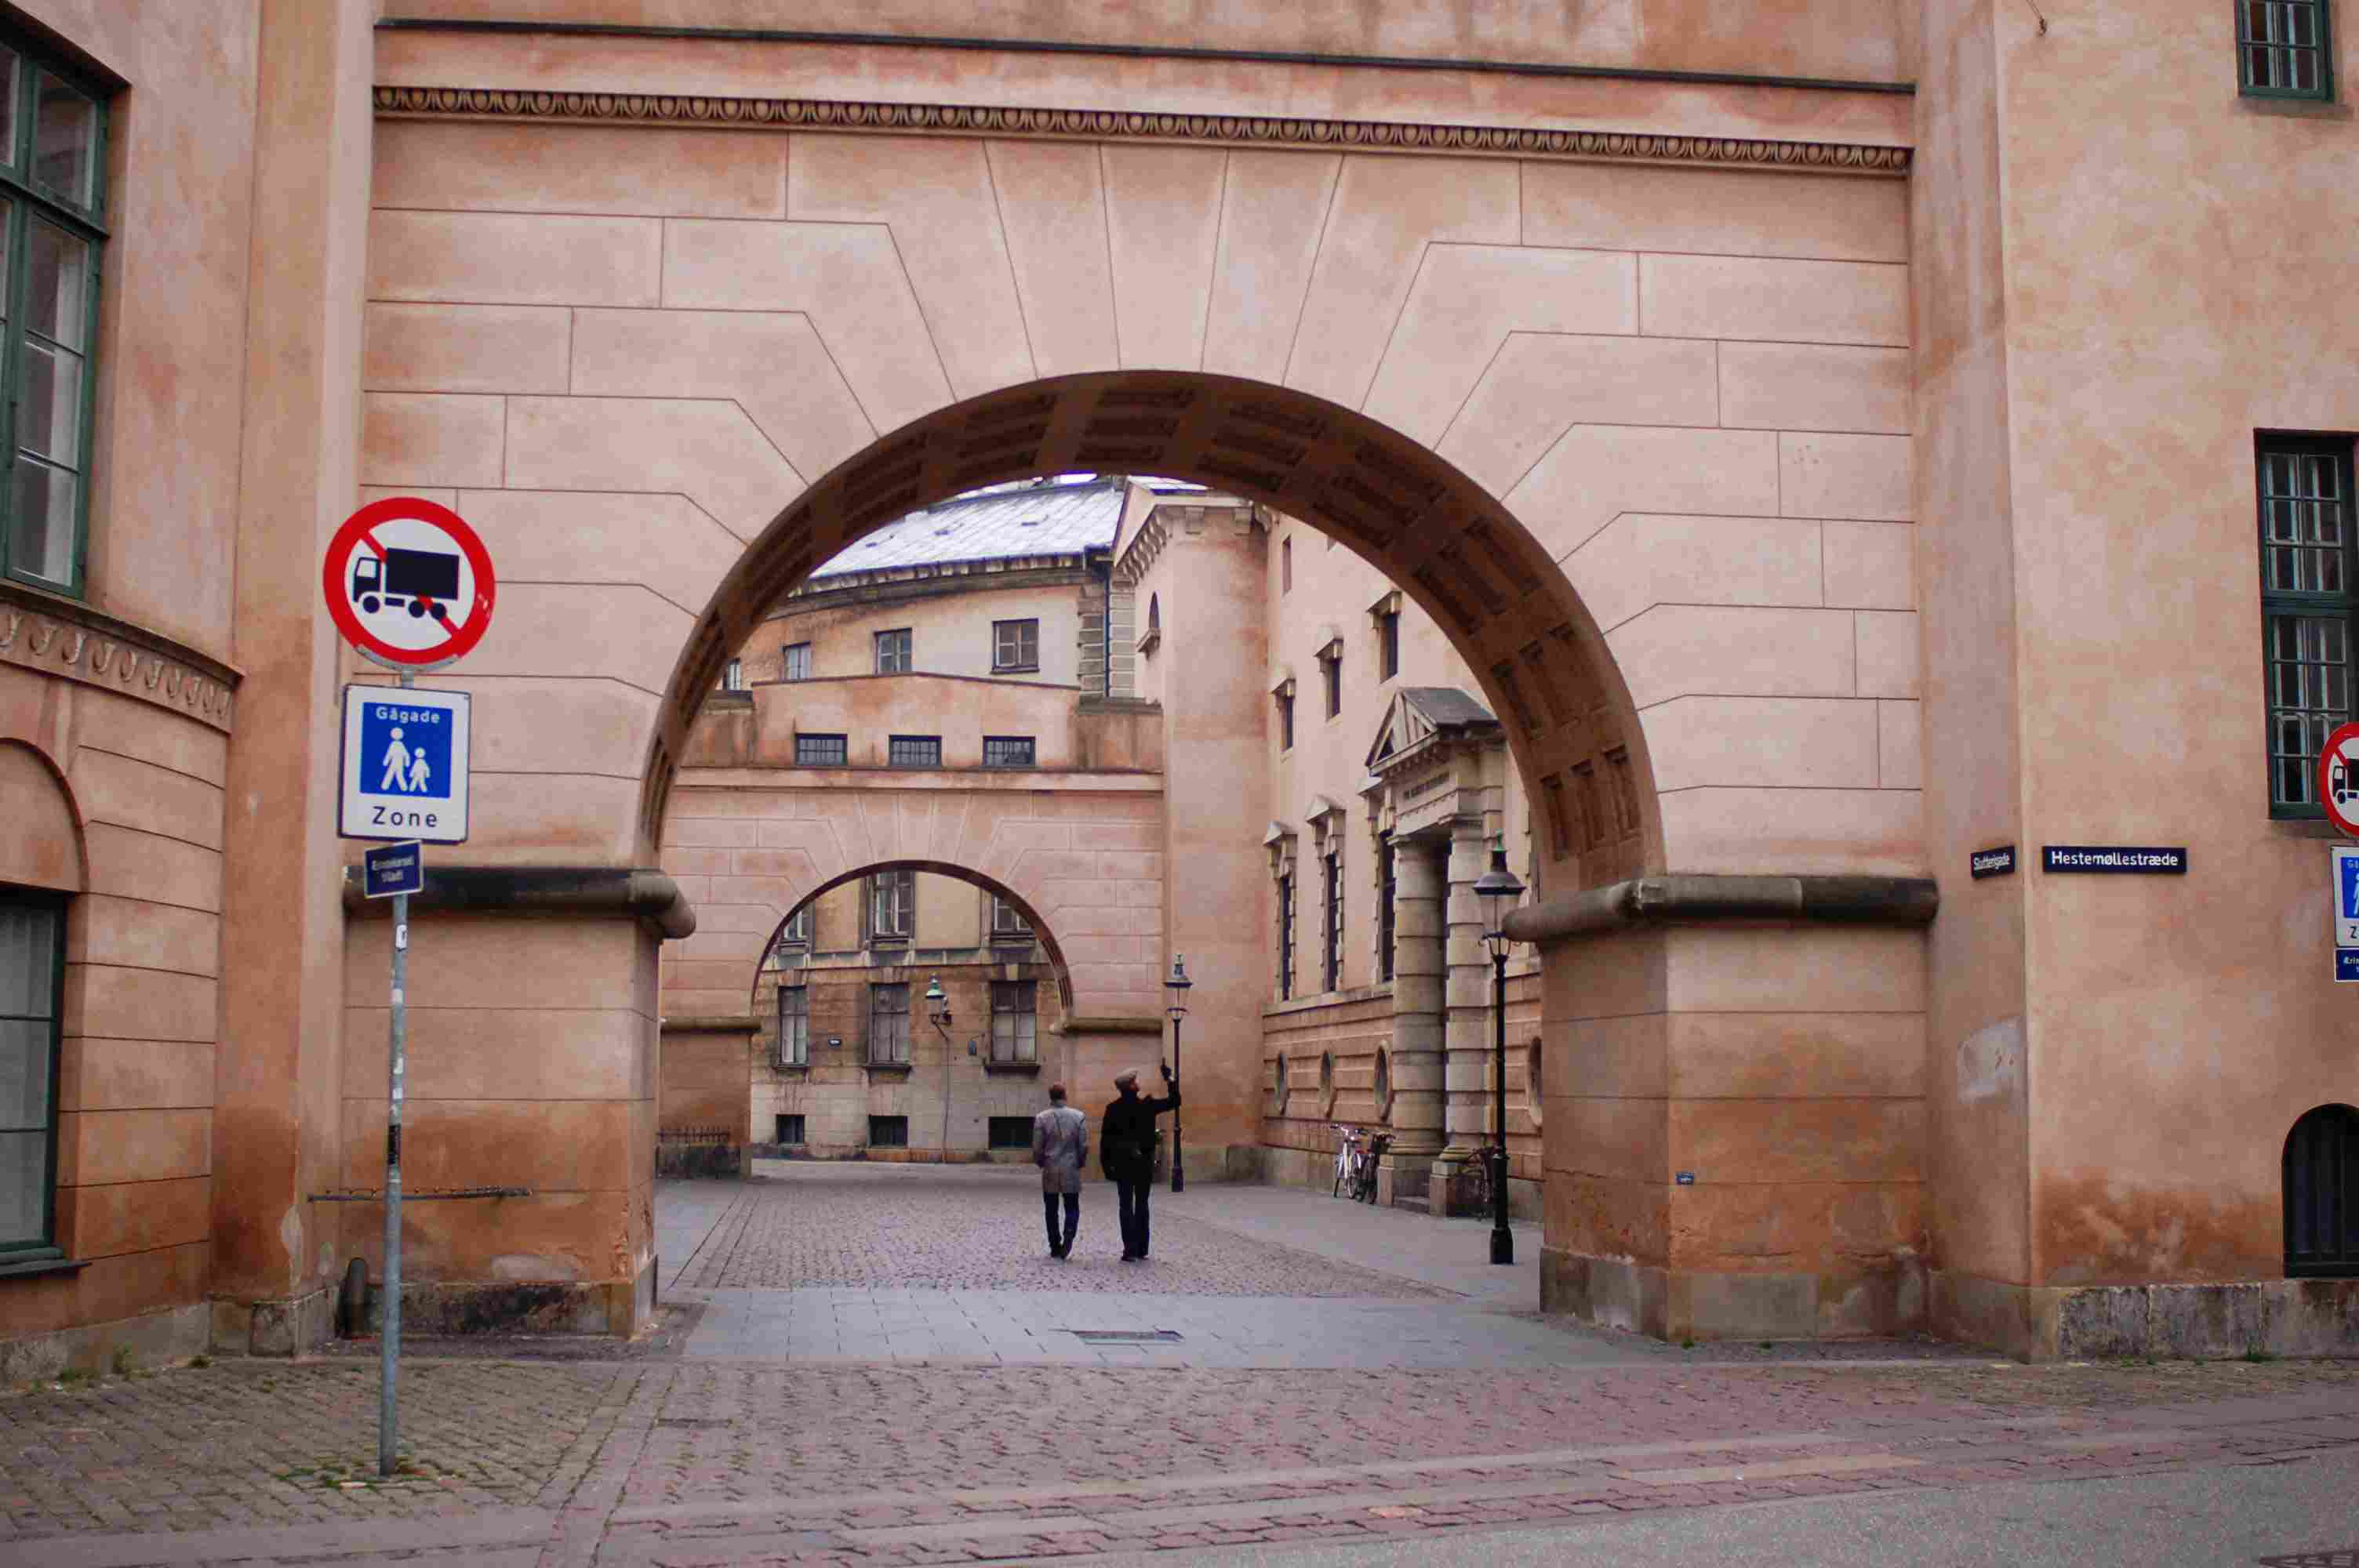 People walking through old archways in Copenhagen